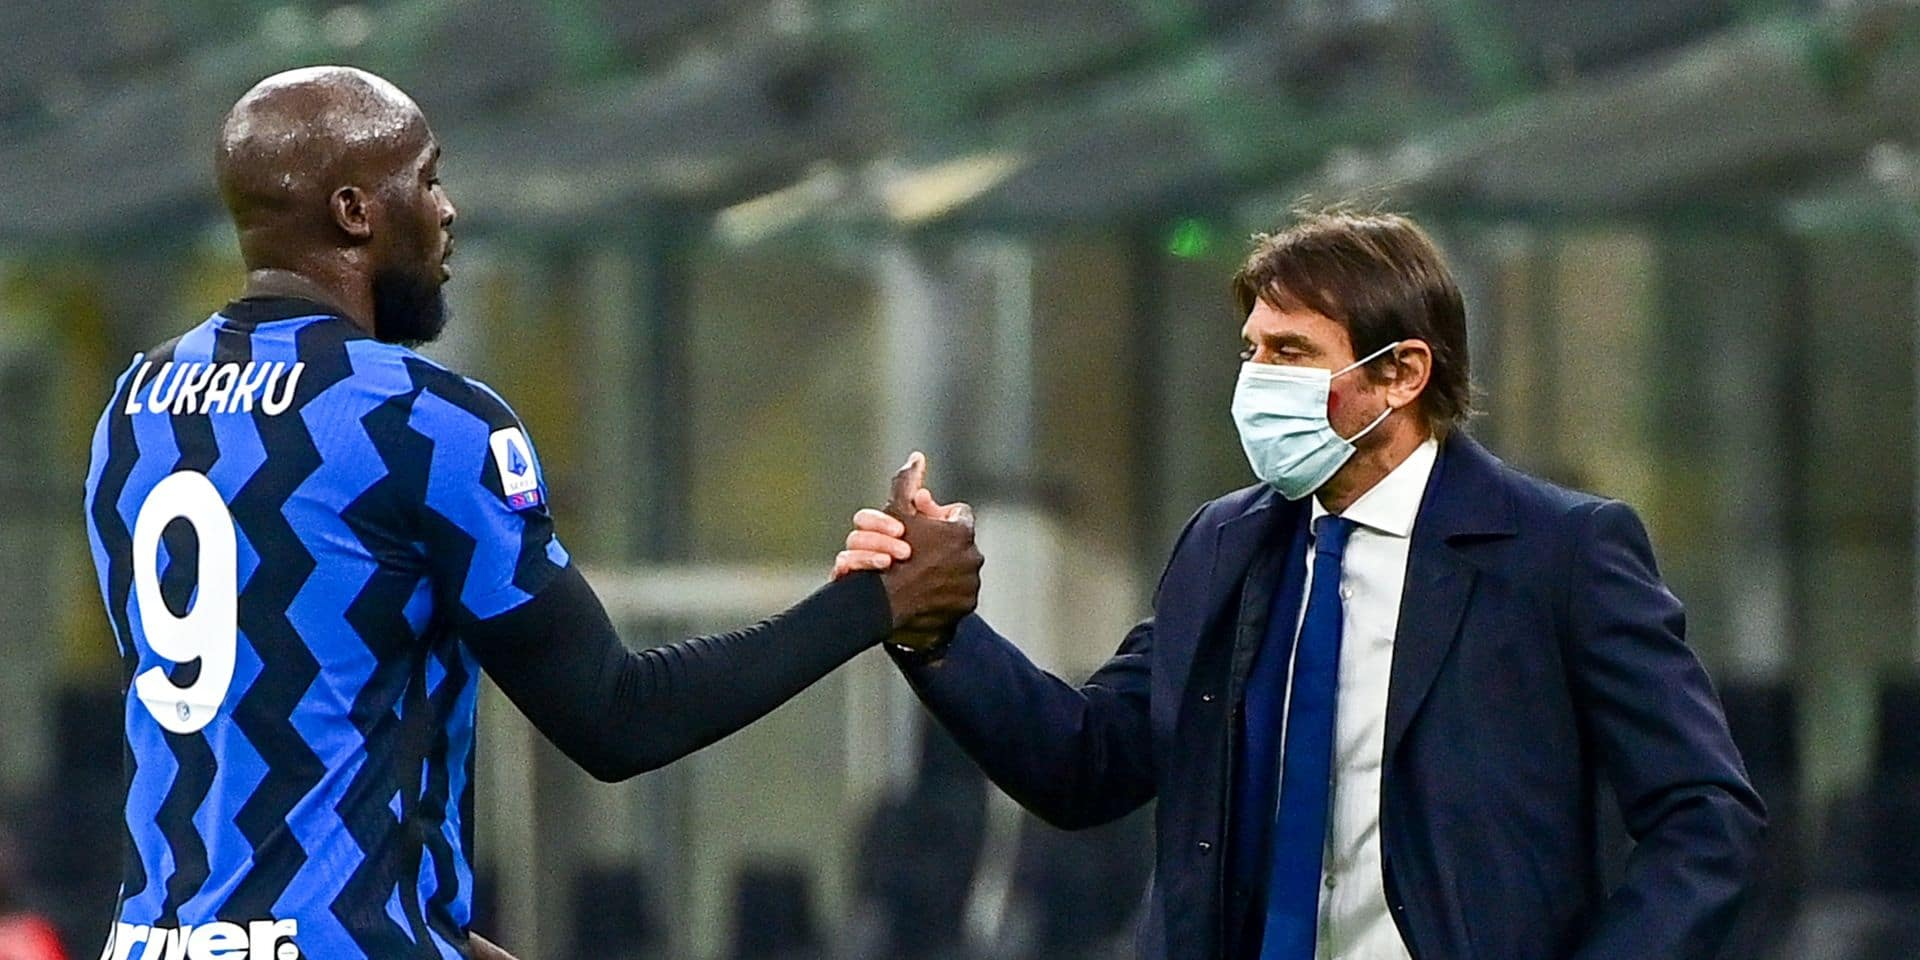 """BANG BANG"", ""un leader"", ""l'Inter à ses pieds"": la presse encense encore Romelu Lukaku après sa prestation XXL contre le Torino"